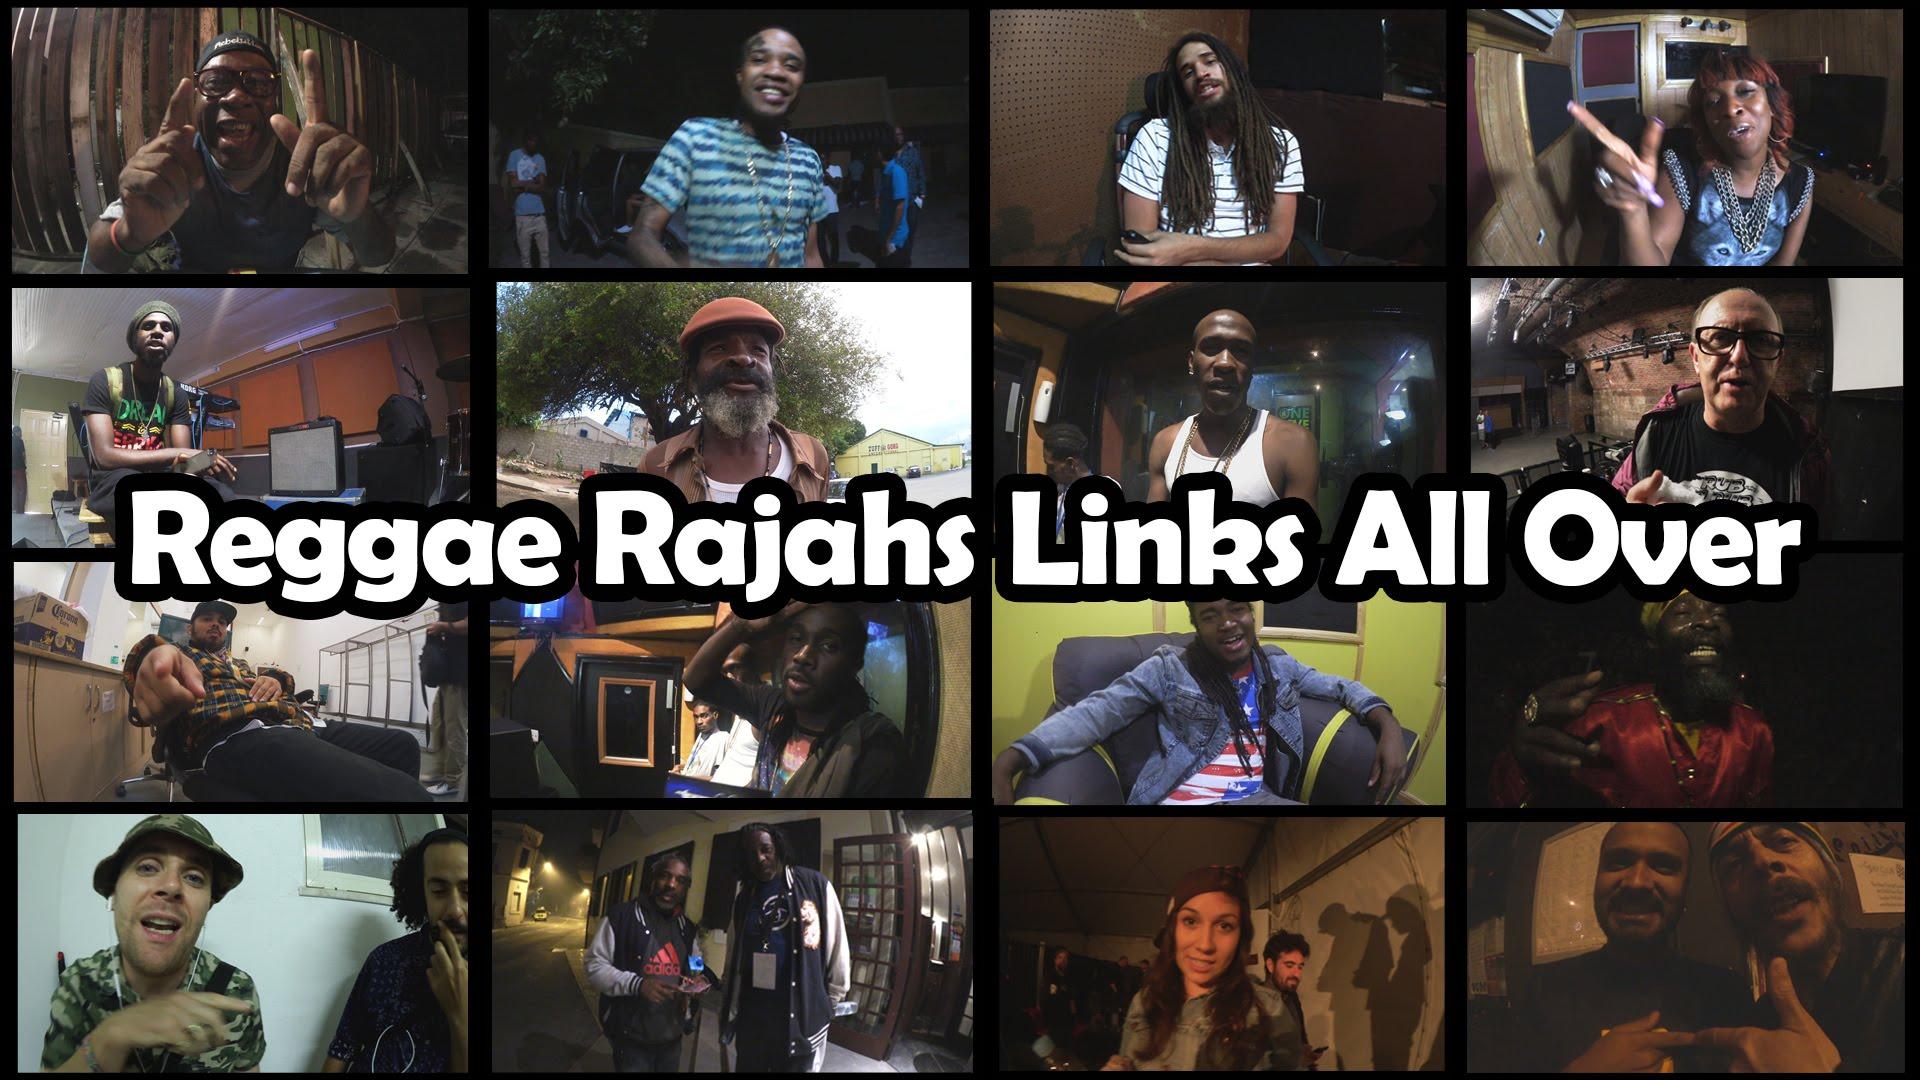 Reggae Rajahs Links All Over [7/30/2015]